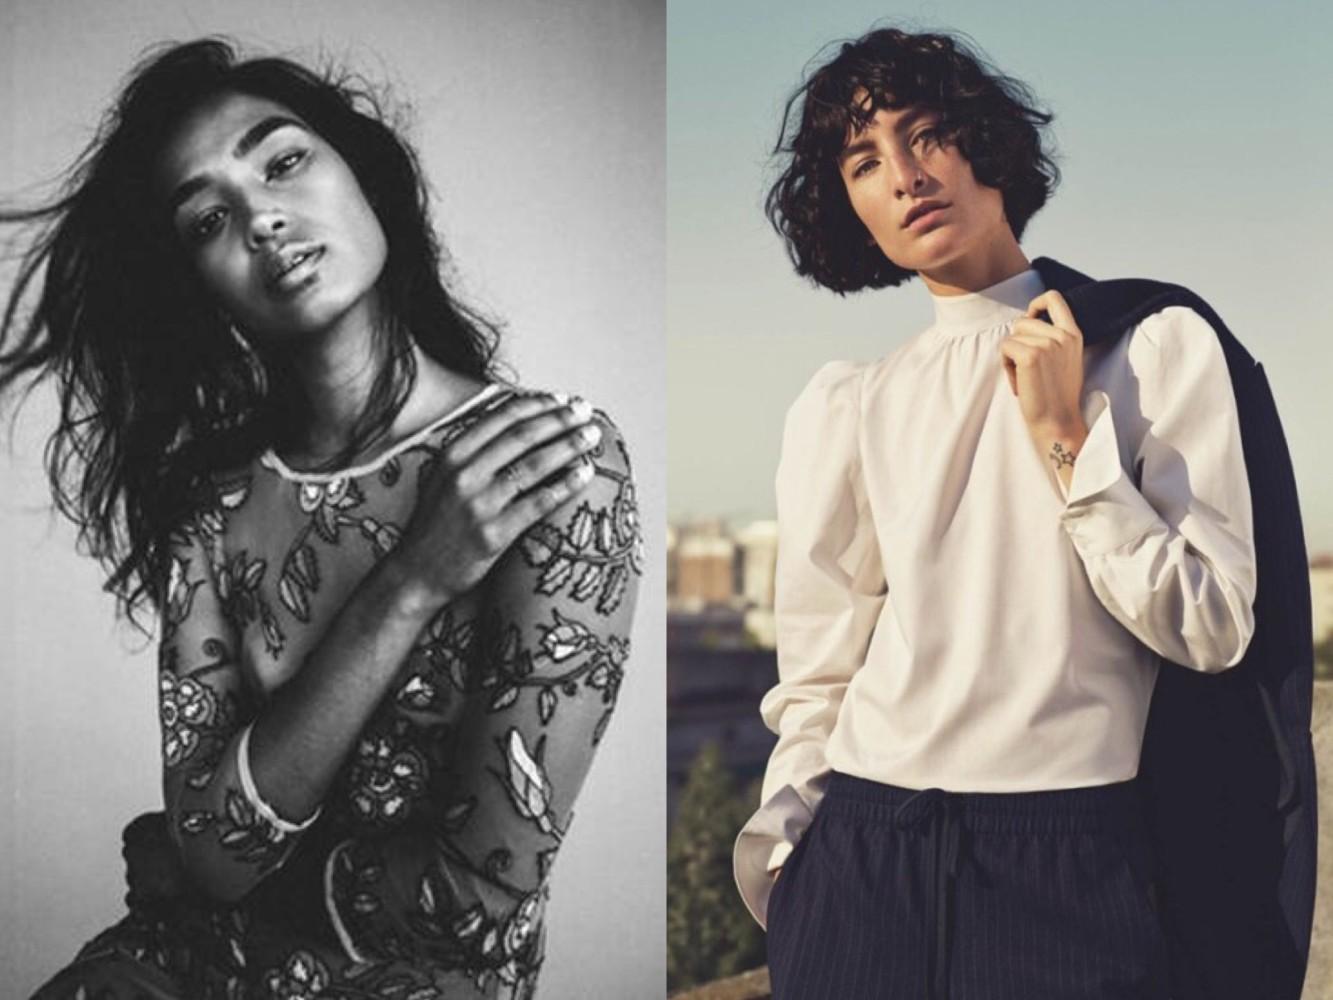 plus-size-campaigns-H&M-Ladylike-Autumn-campaign-top-plus-modelling-facts